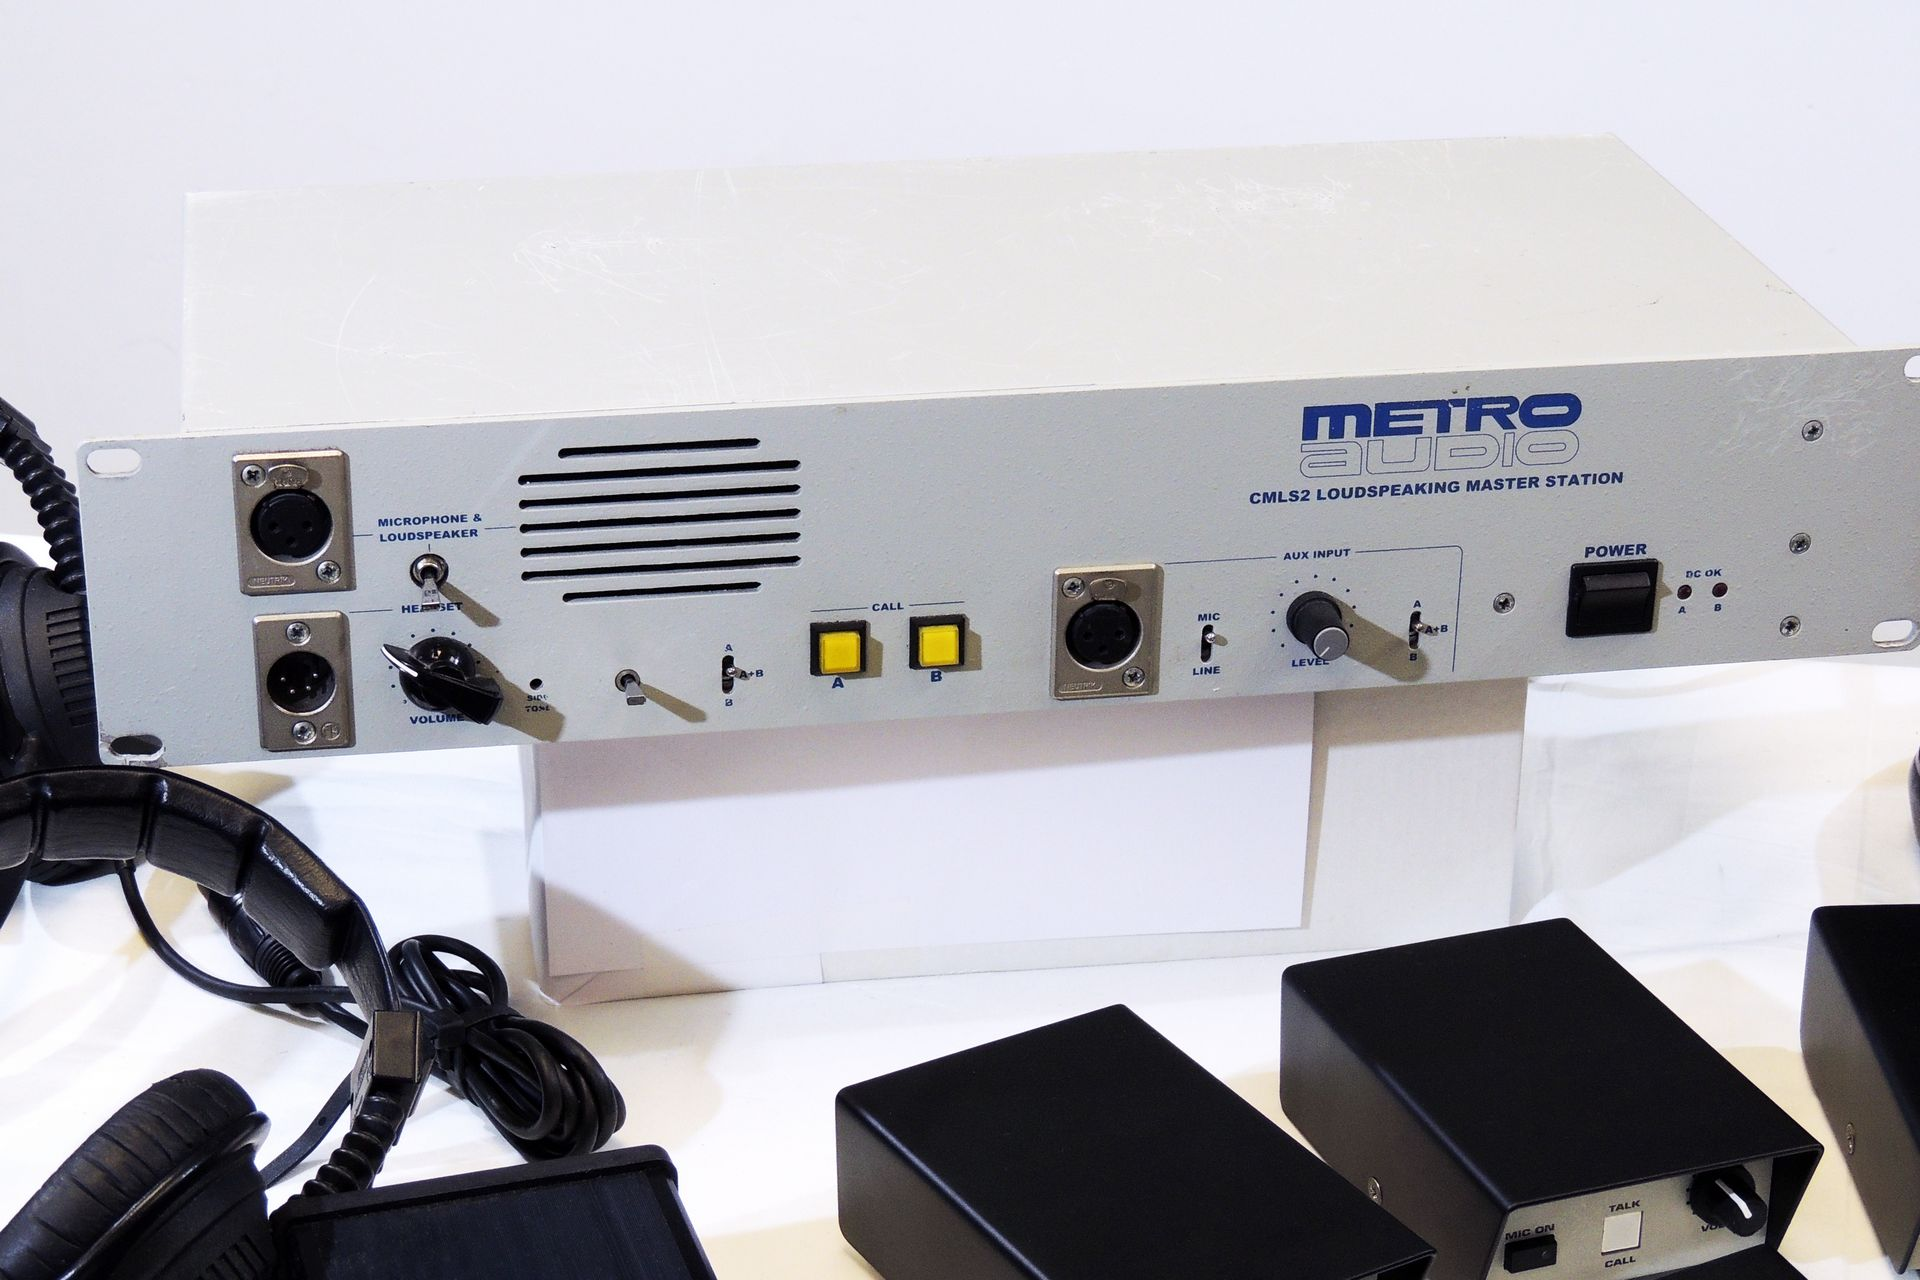 Metro Audio Stonewood theatre coms system for sale at Plasma Music